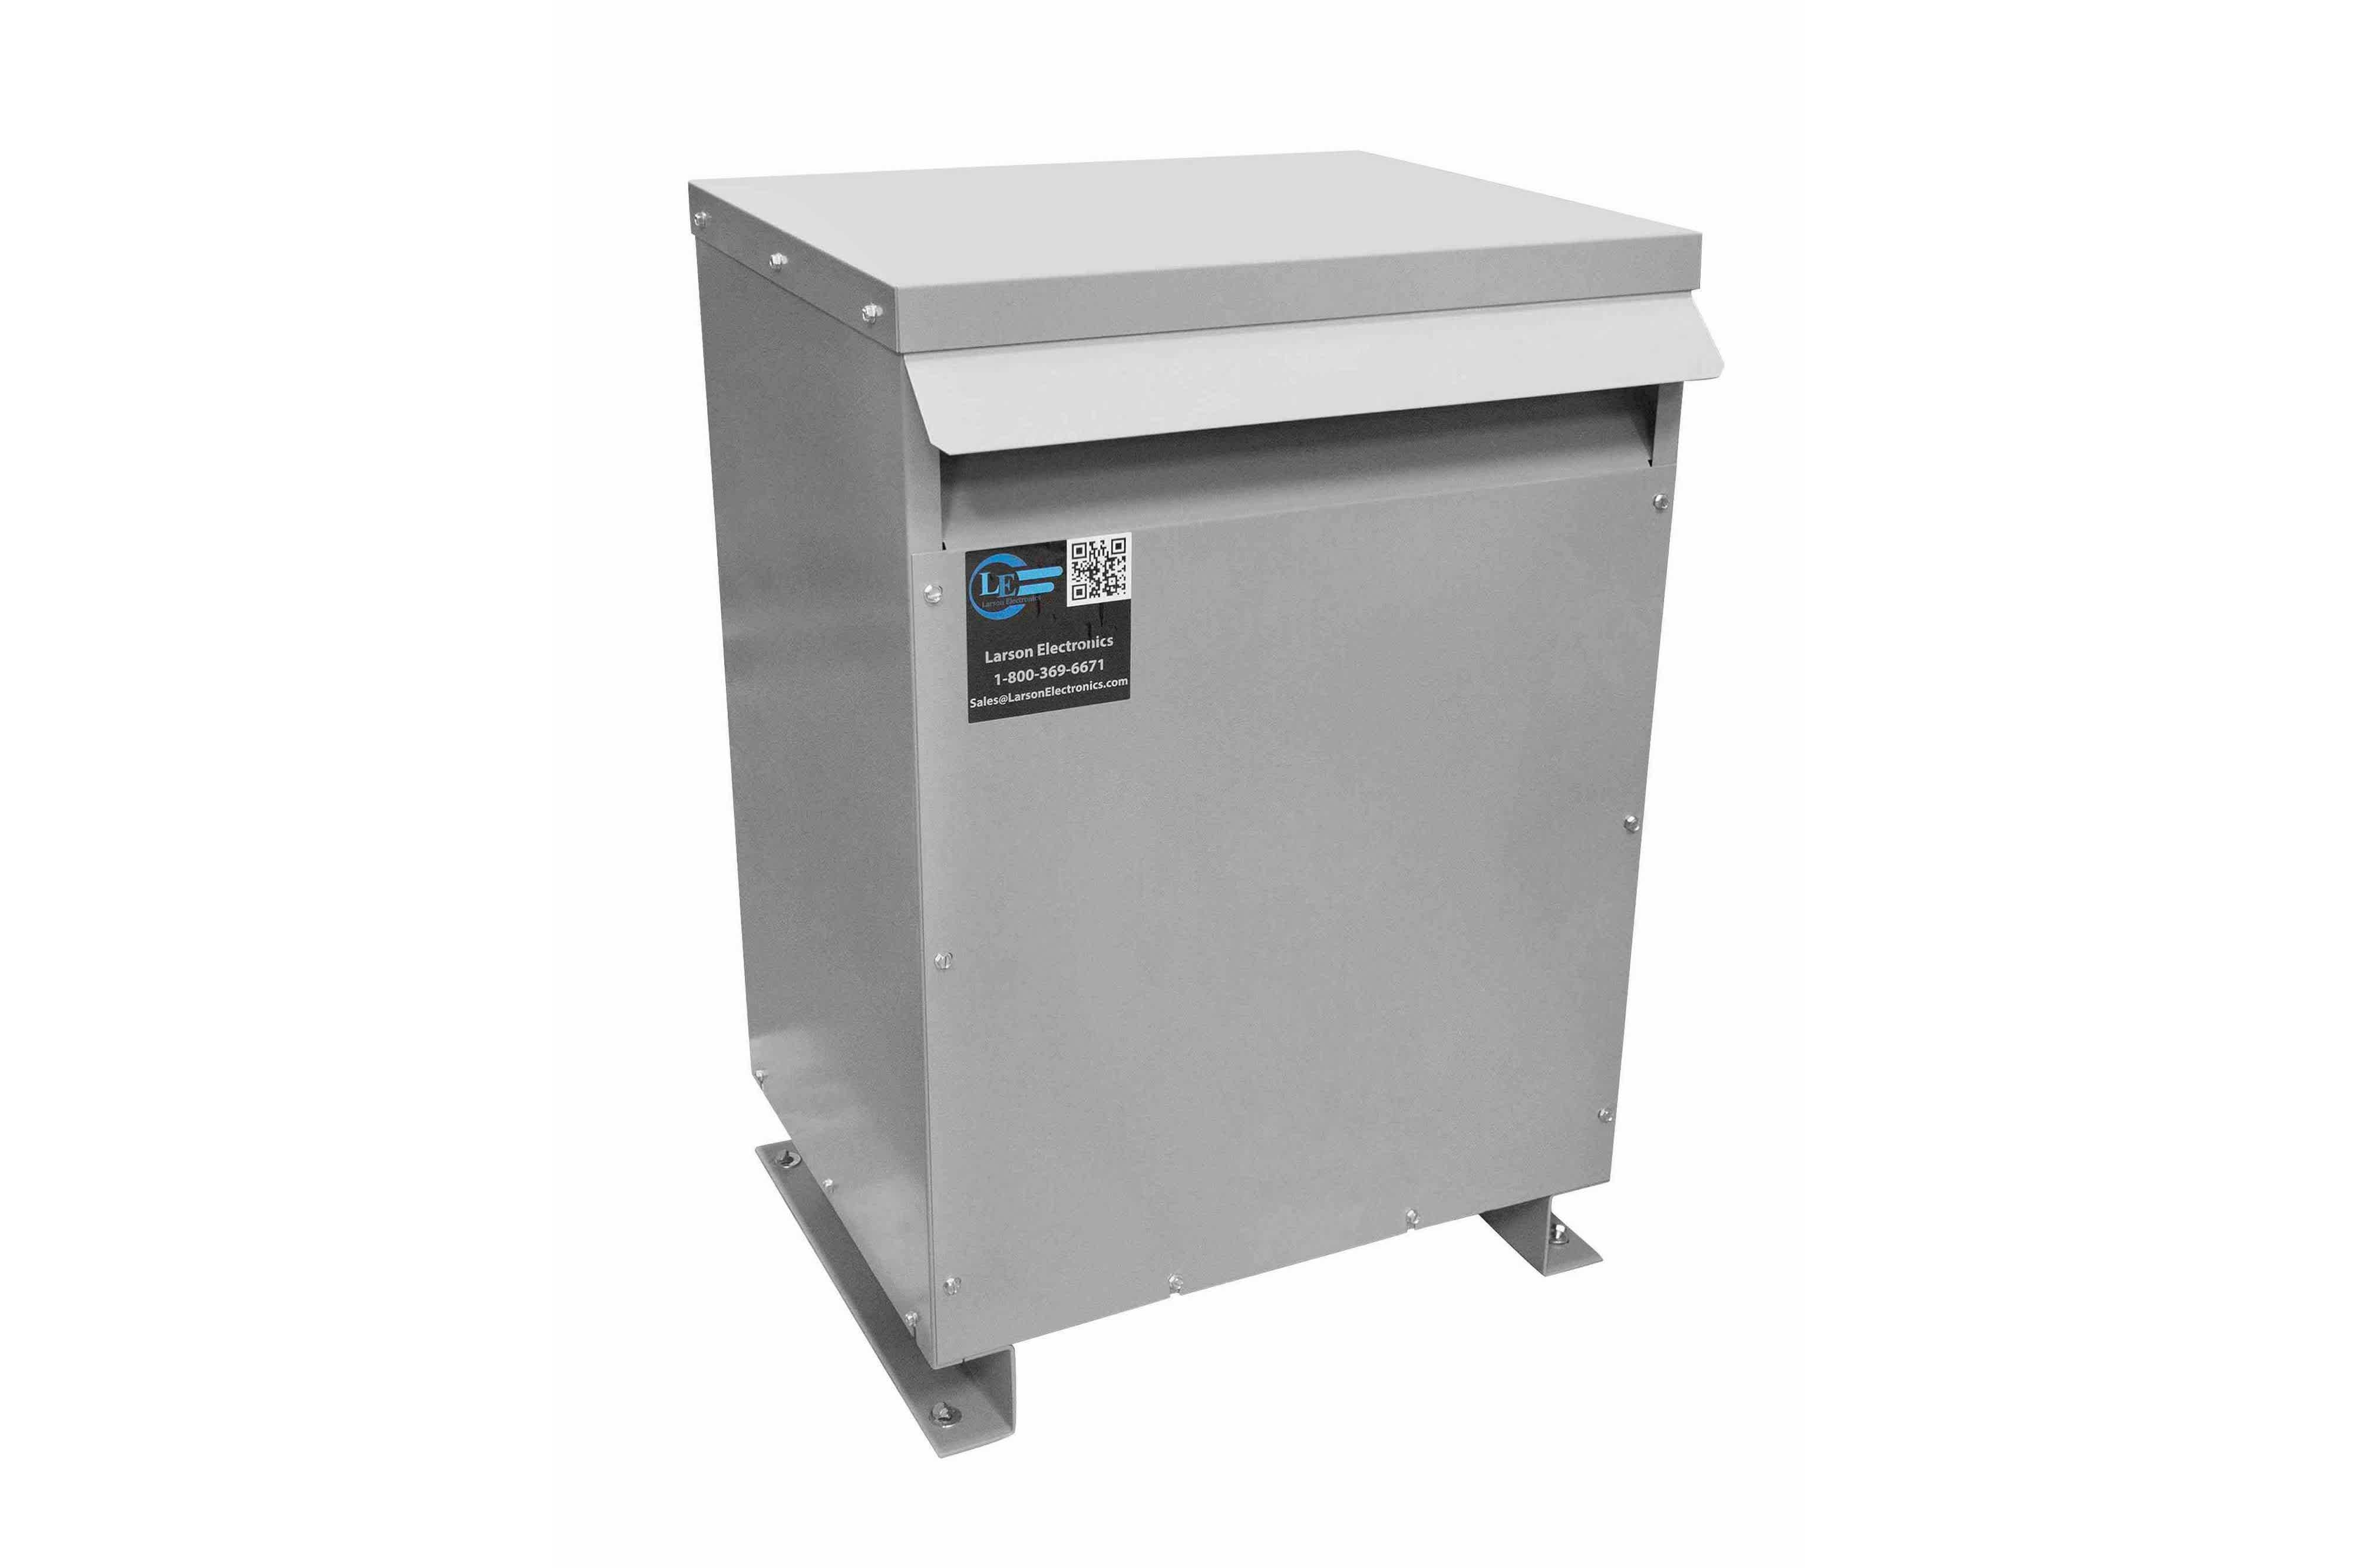 9 kVA 3PH Isolation Transformer, 415V Wye Primary, 600V Delta Secondary, N3R, Ventilated, 60 Hz